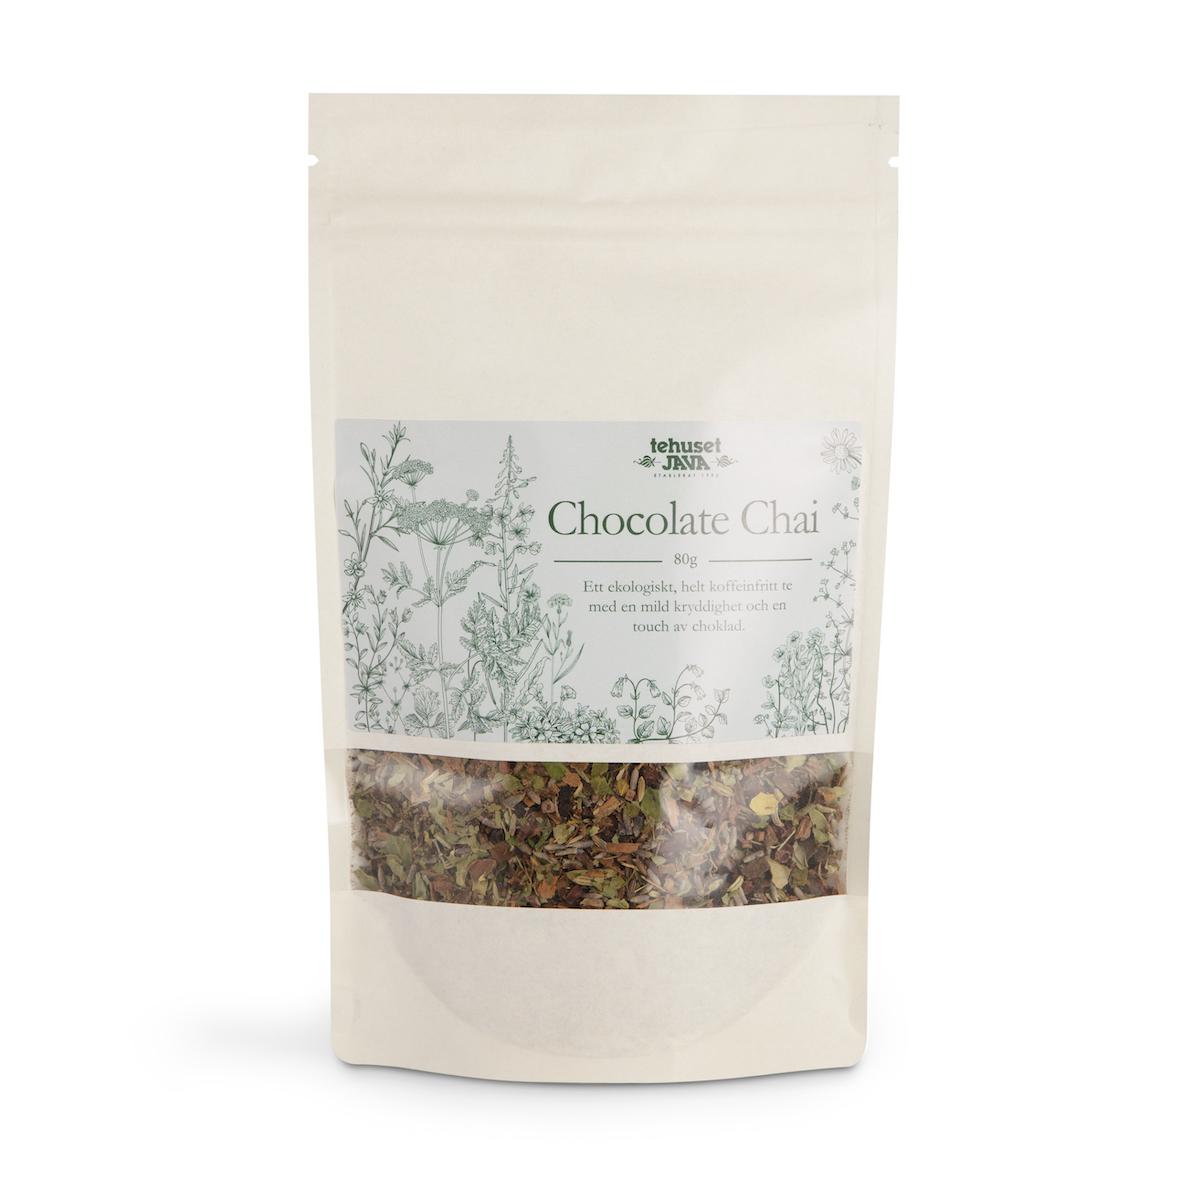 Hälsote Chocolate Chai 80g